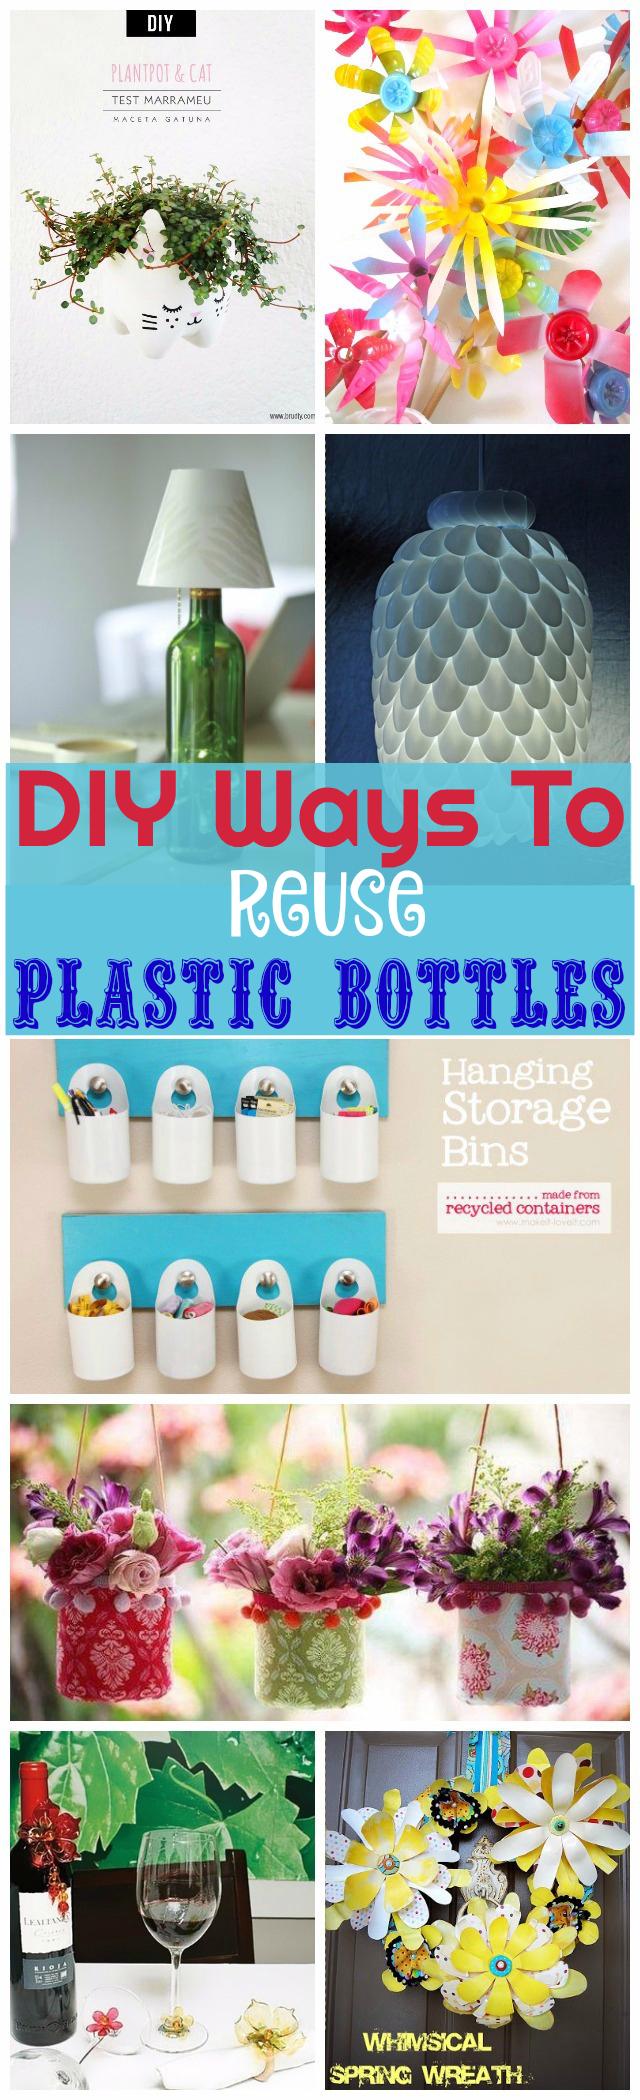 Reuse Plastic Bottles DIY